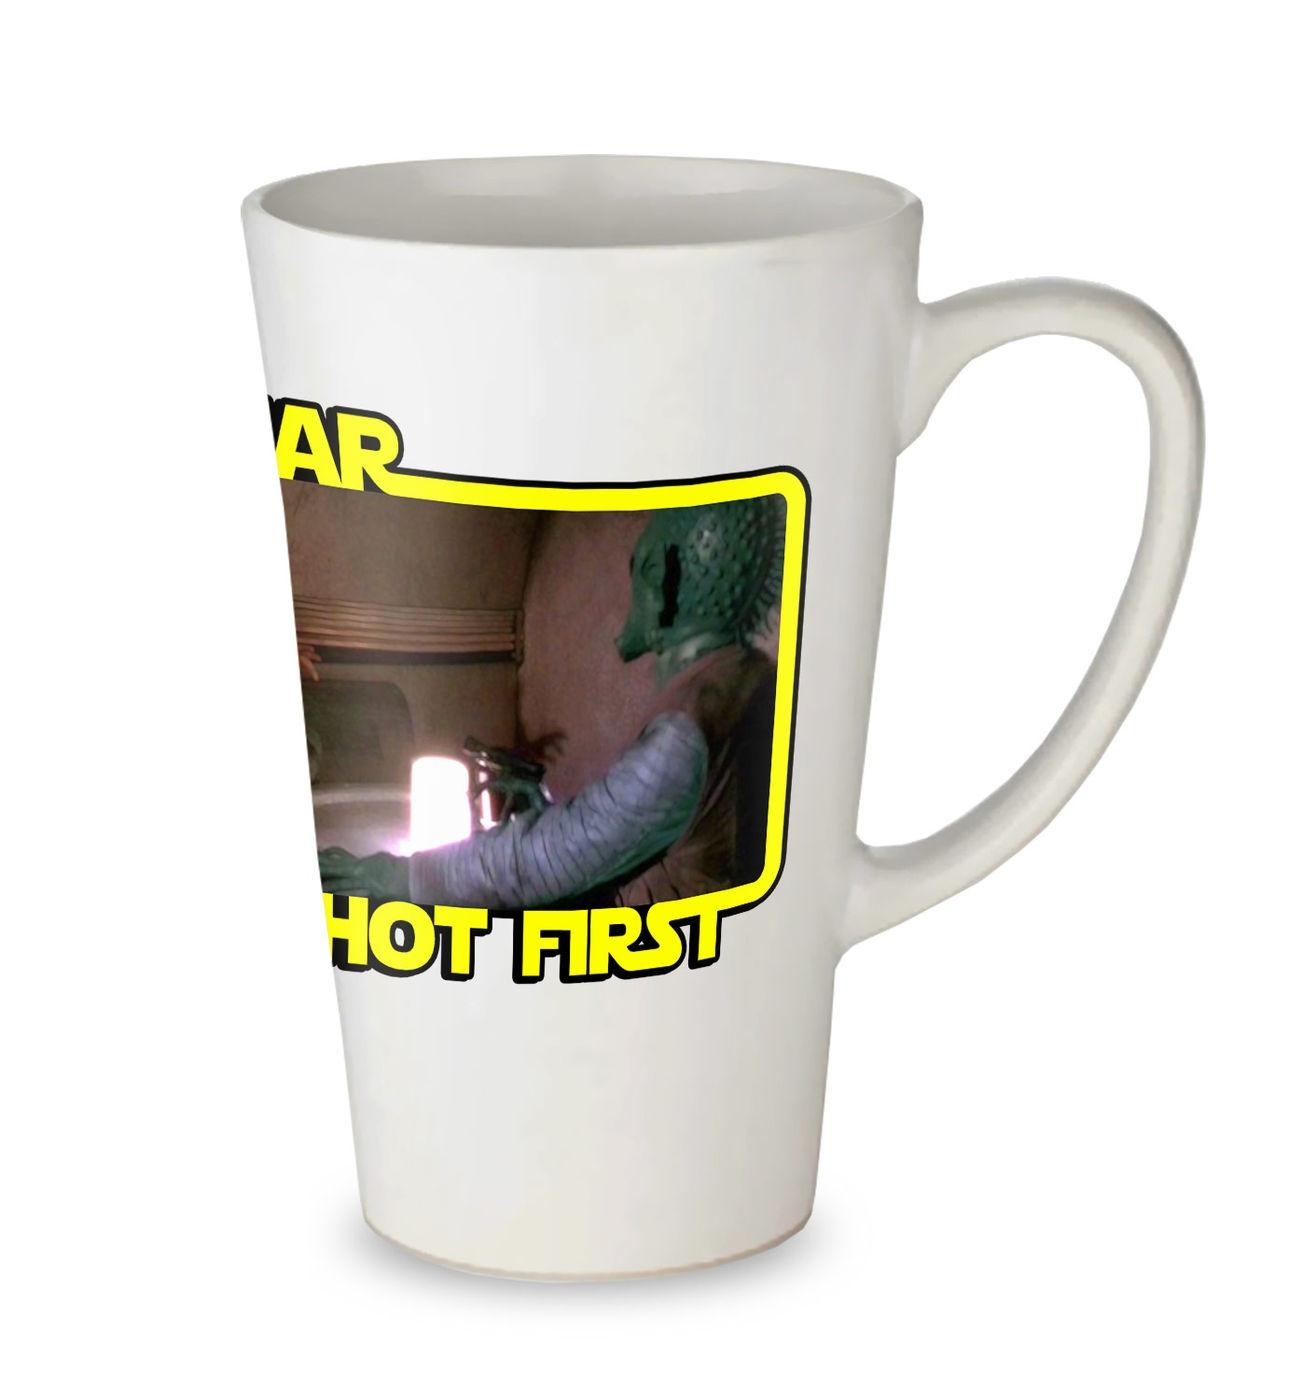 Jar Jar Shot First tall latte mug - funny parody Star Wars latte mug